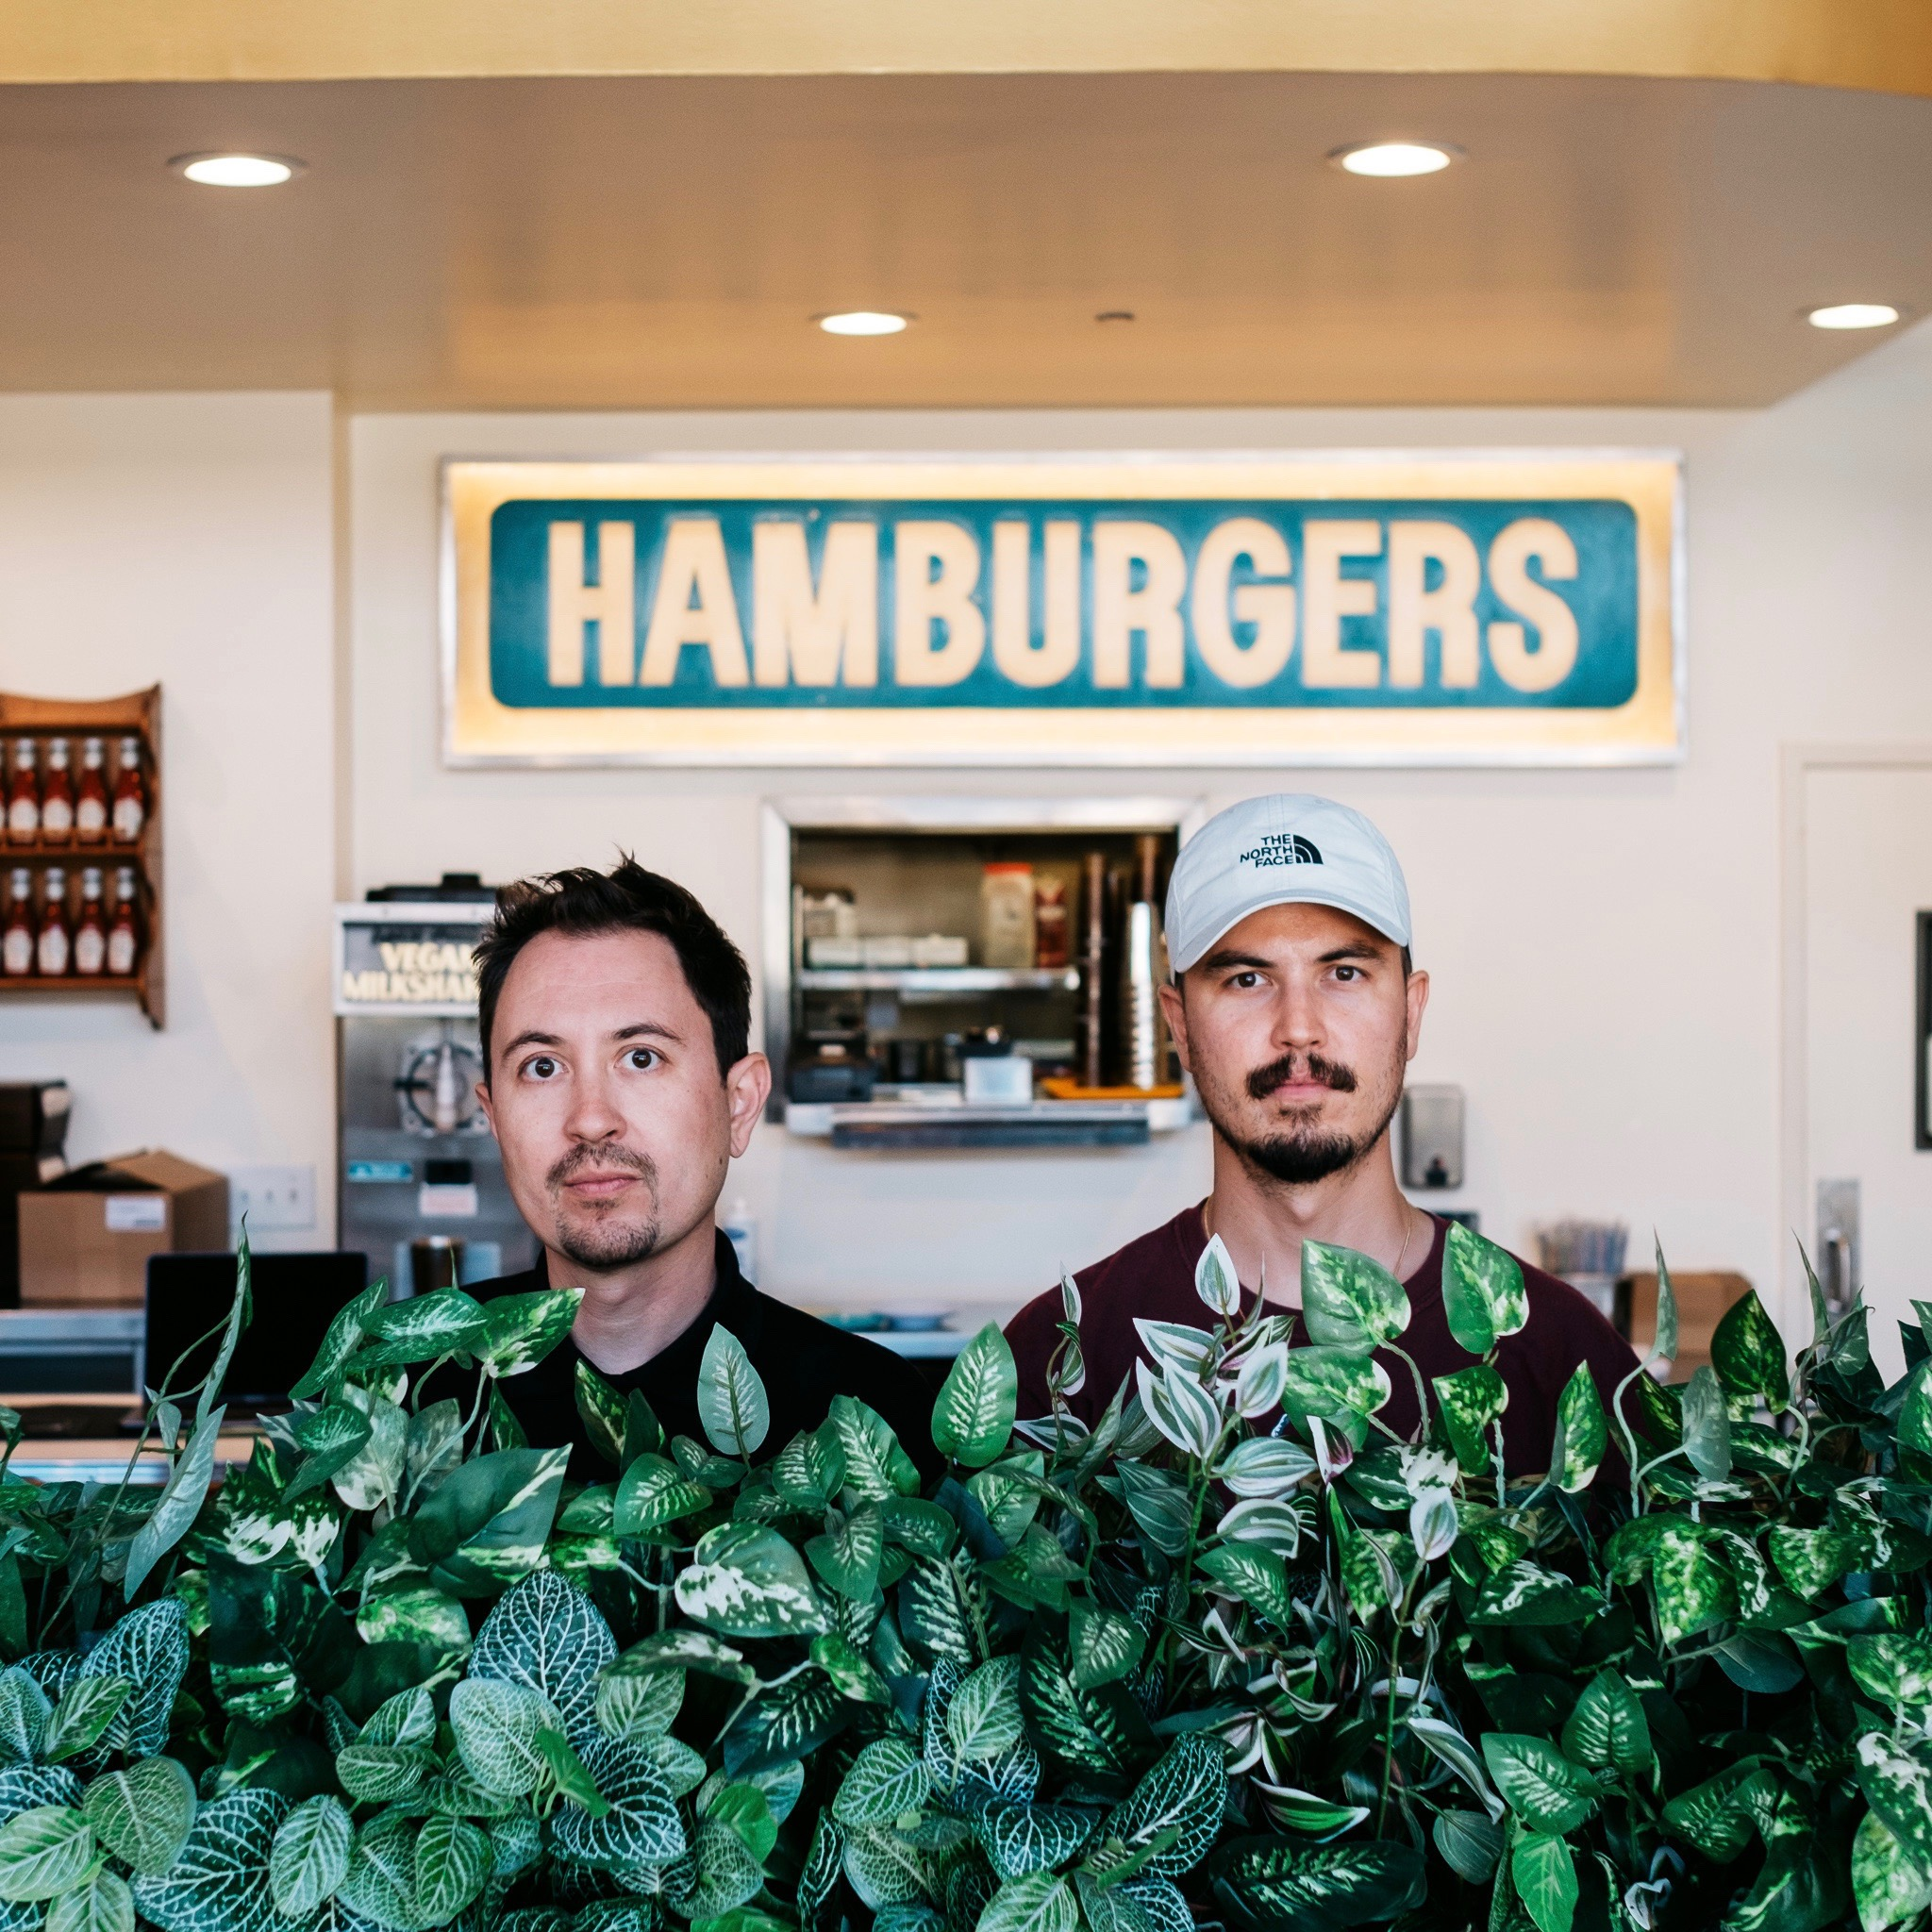 Burgerlords Portrait.jpg